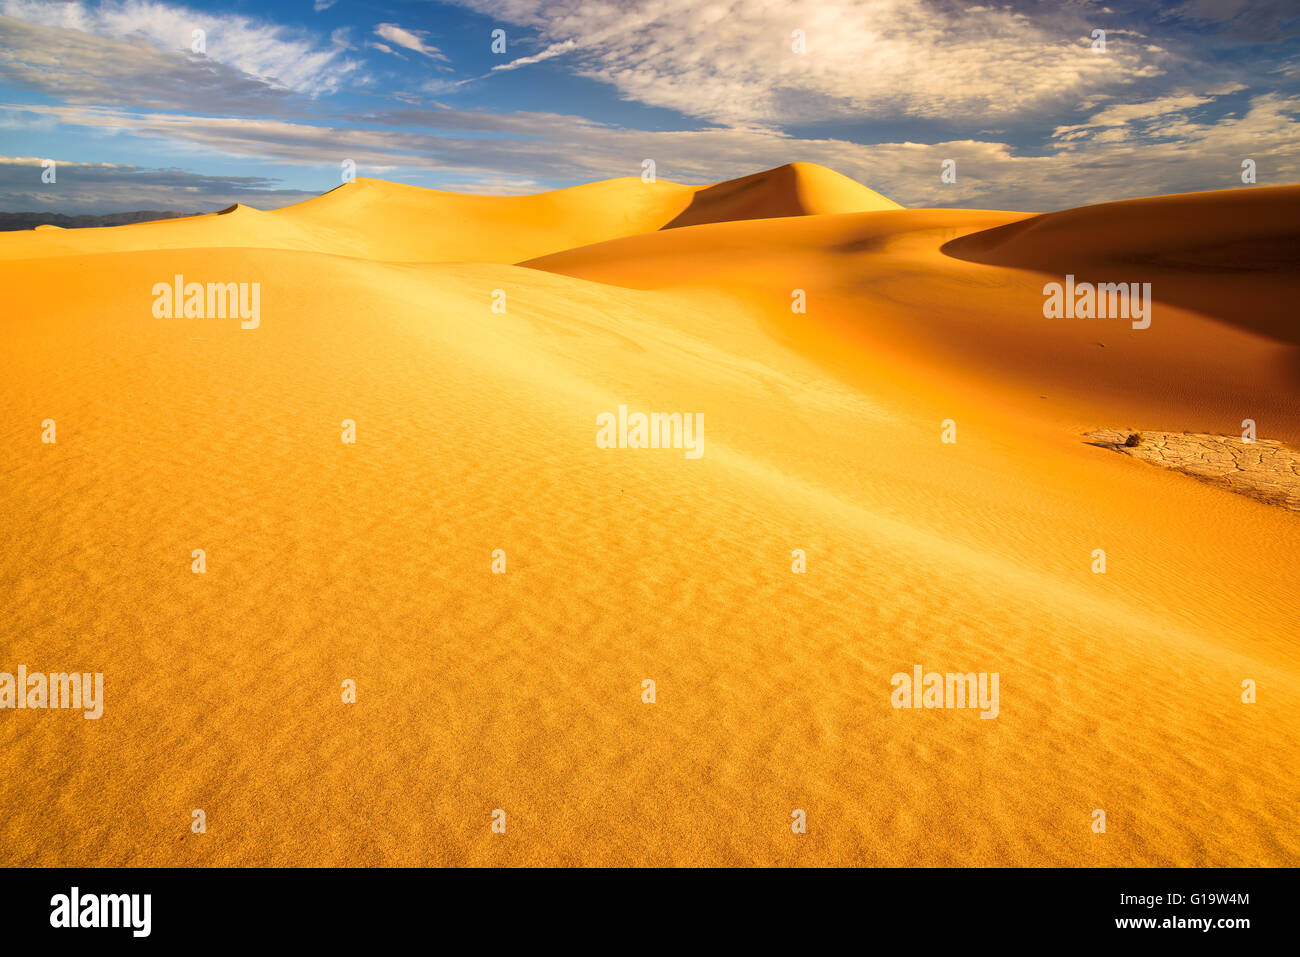 Sand dunes at heat sunrise in the Desert - Stock Image